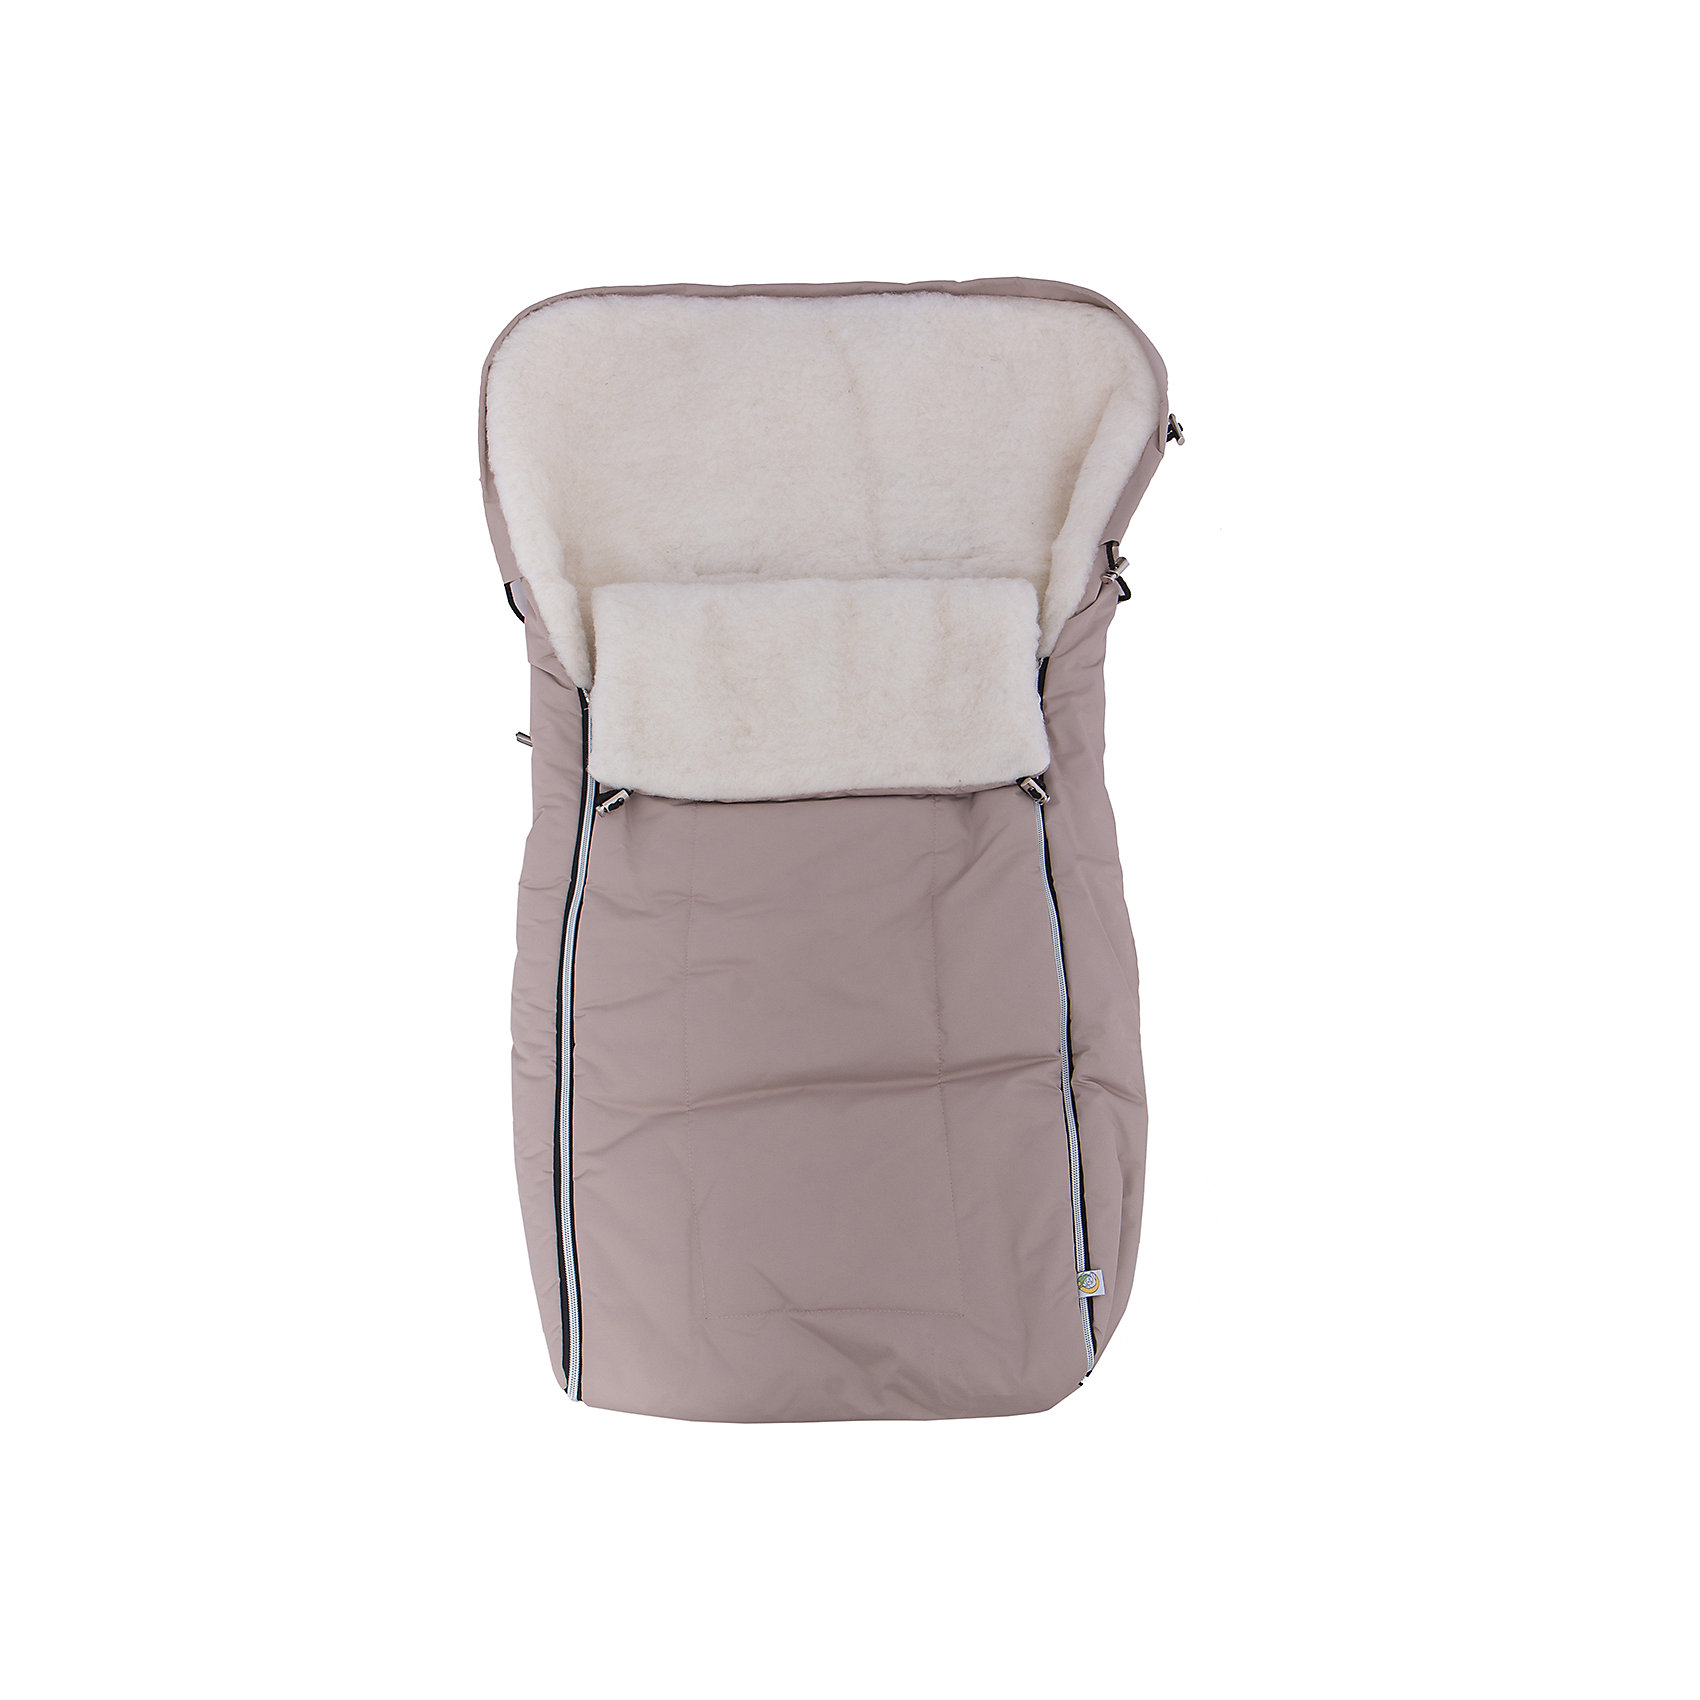 Сонный гномик Конверт в коляску Норд, Сонный гномик, бежевый сонный гномик конверт зимний норд серый